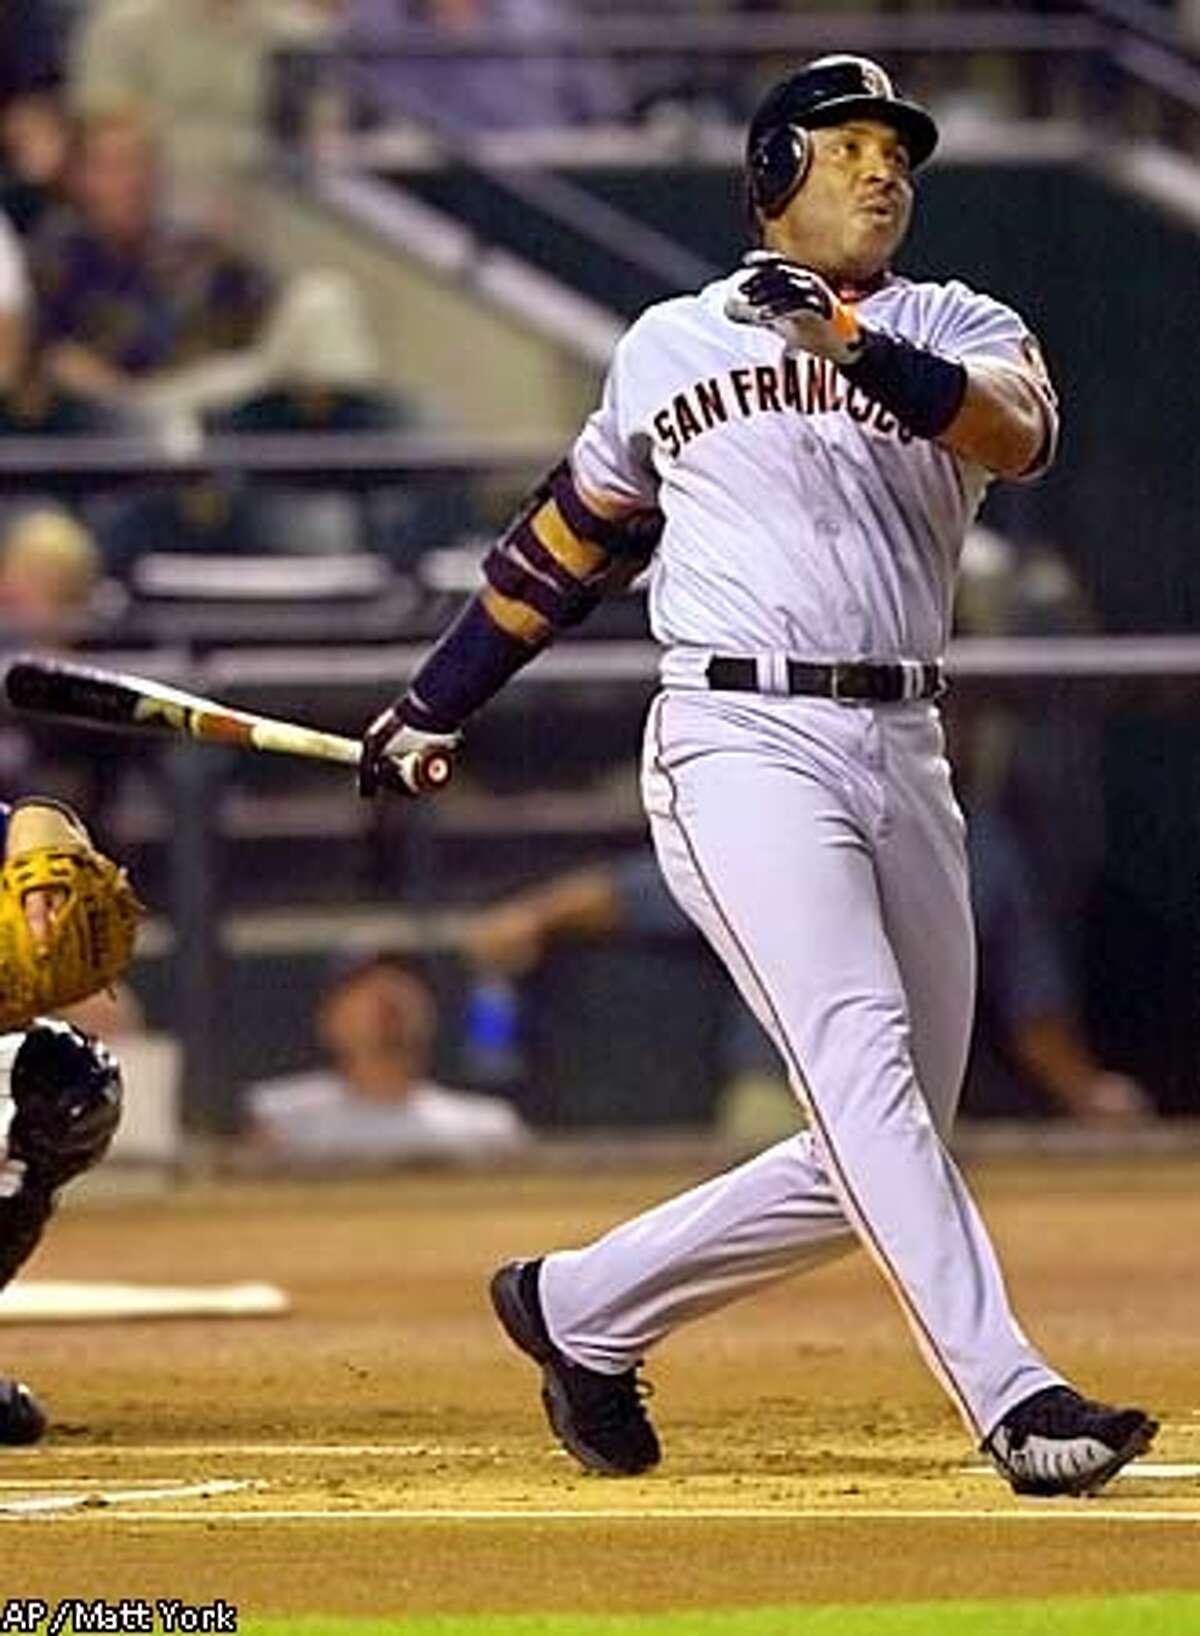 San Francisco Giants' Barry Bonds blasts his 45th home run of the season during the fourth innning against the Arizona Diamondbacks at Bank One Ballpark in Phoenix Friday, July 27 2001. (AP Photo/Matt York)